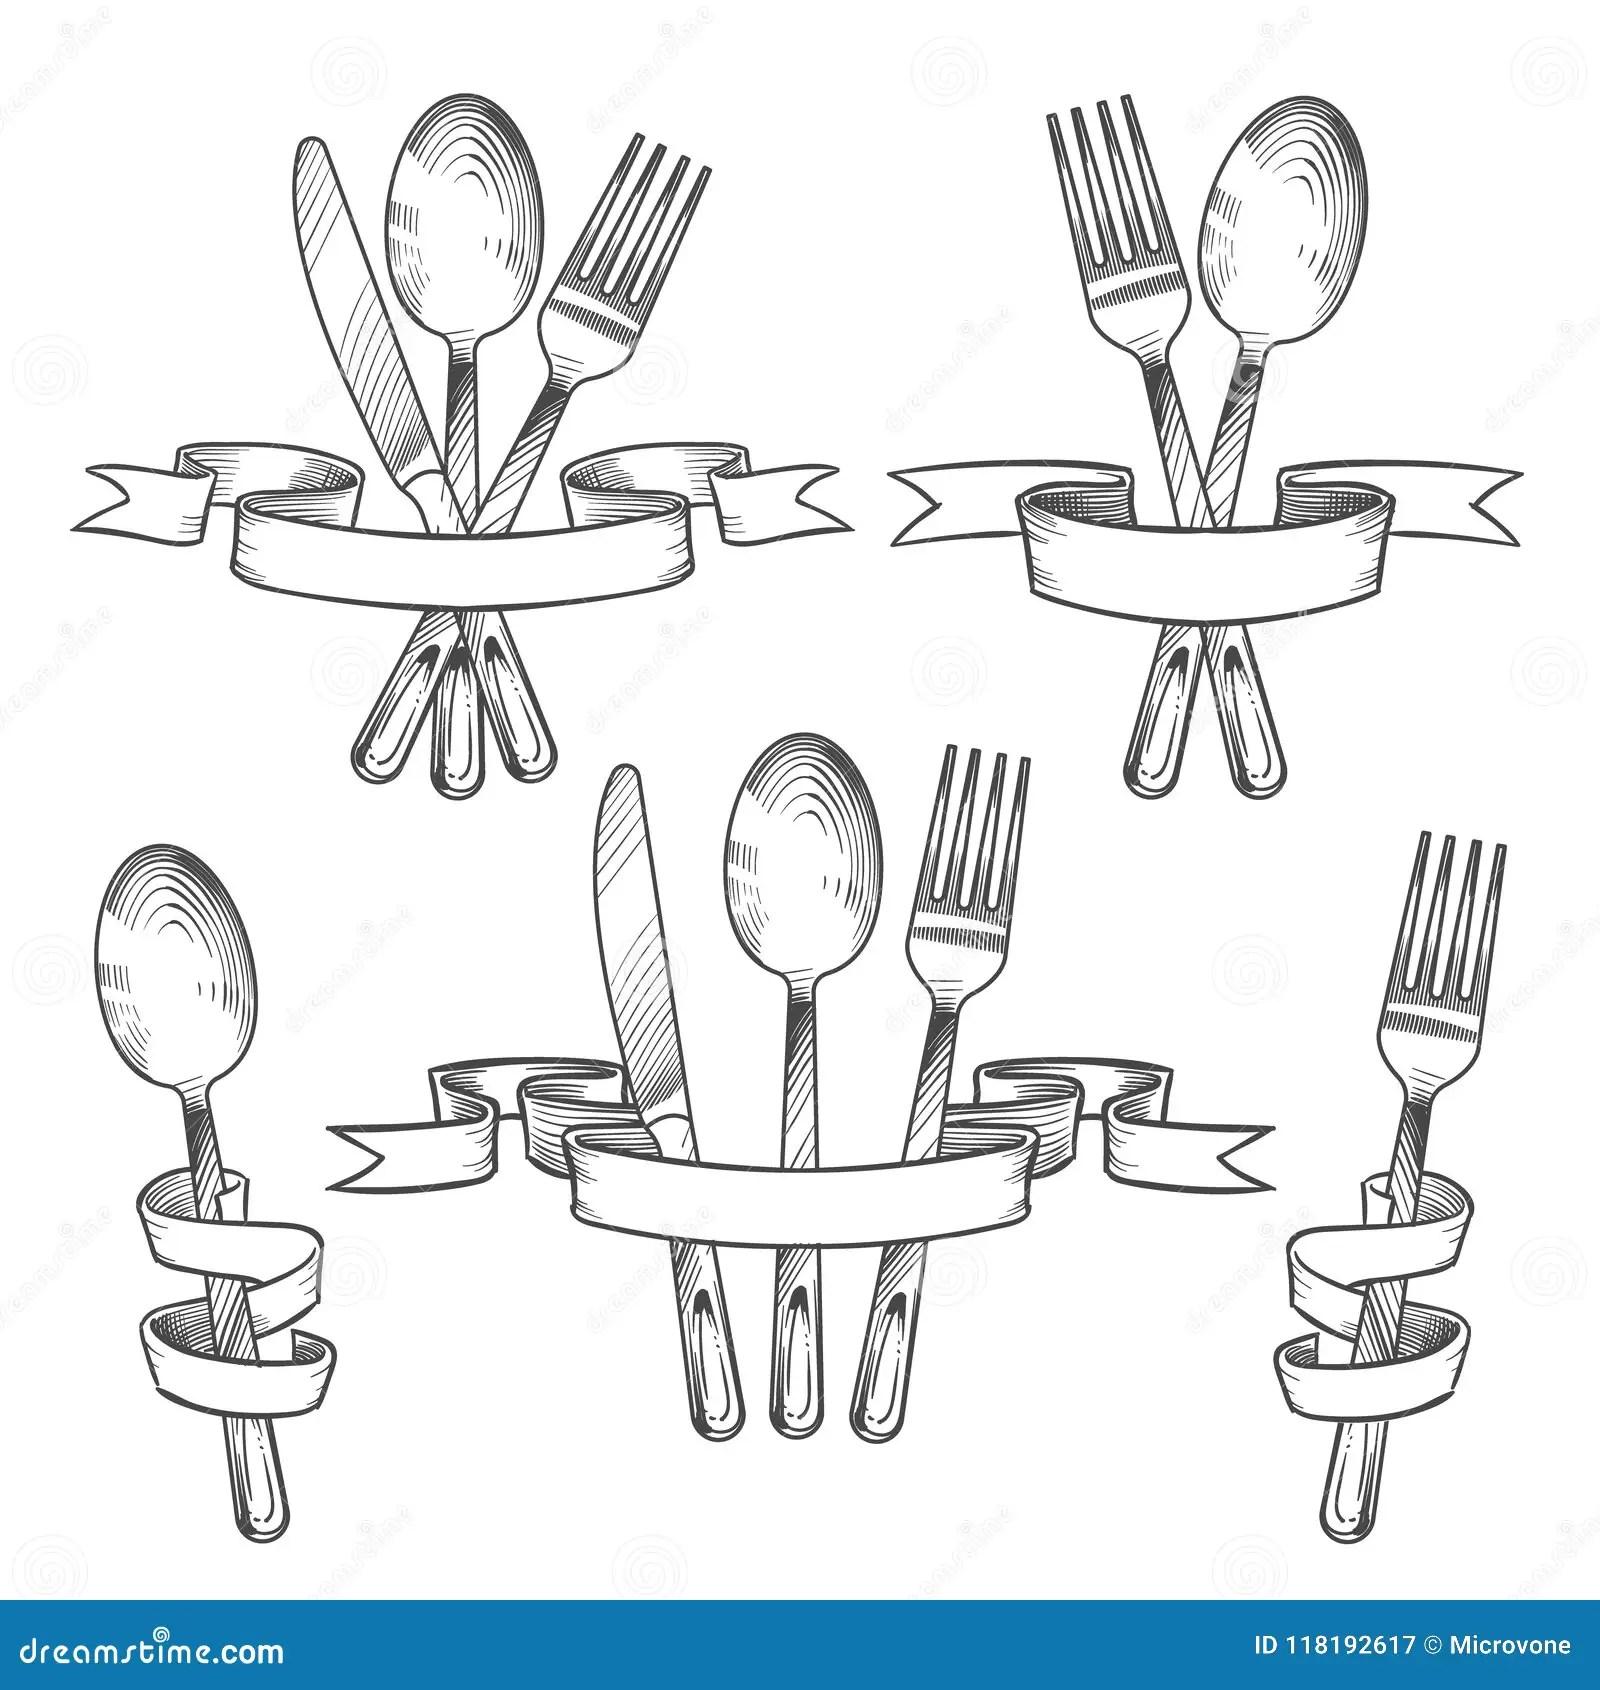 Silverware Cutlery Dinner Table Utensils Knife Spoon